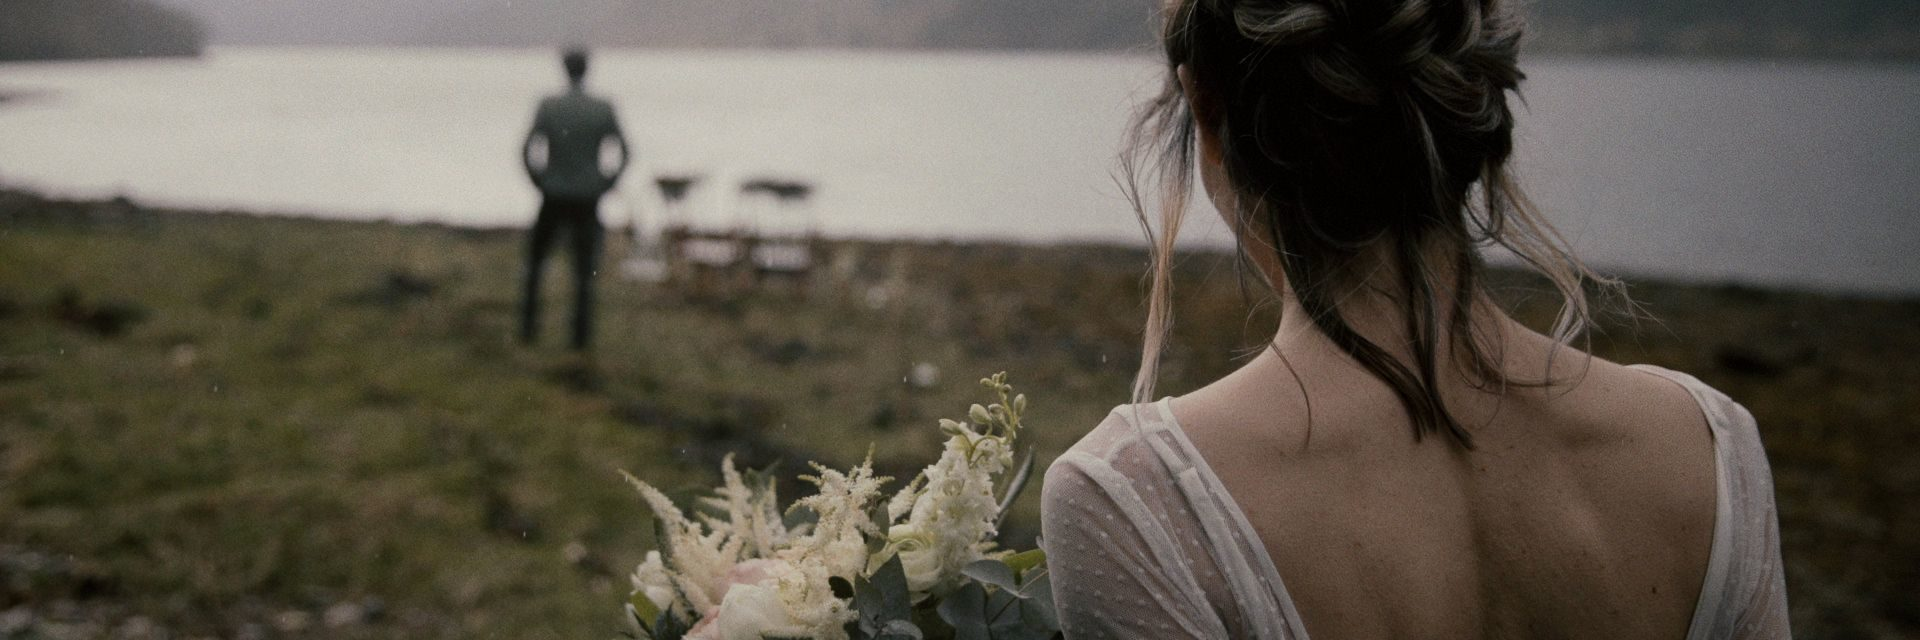 Helsinki-wedding-videographer-cinemate-films-02